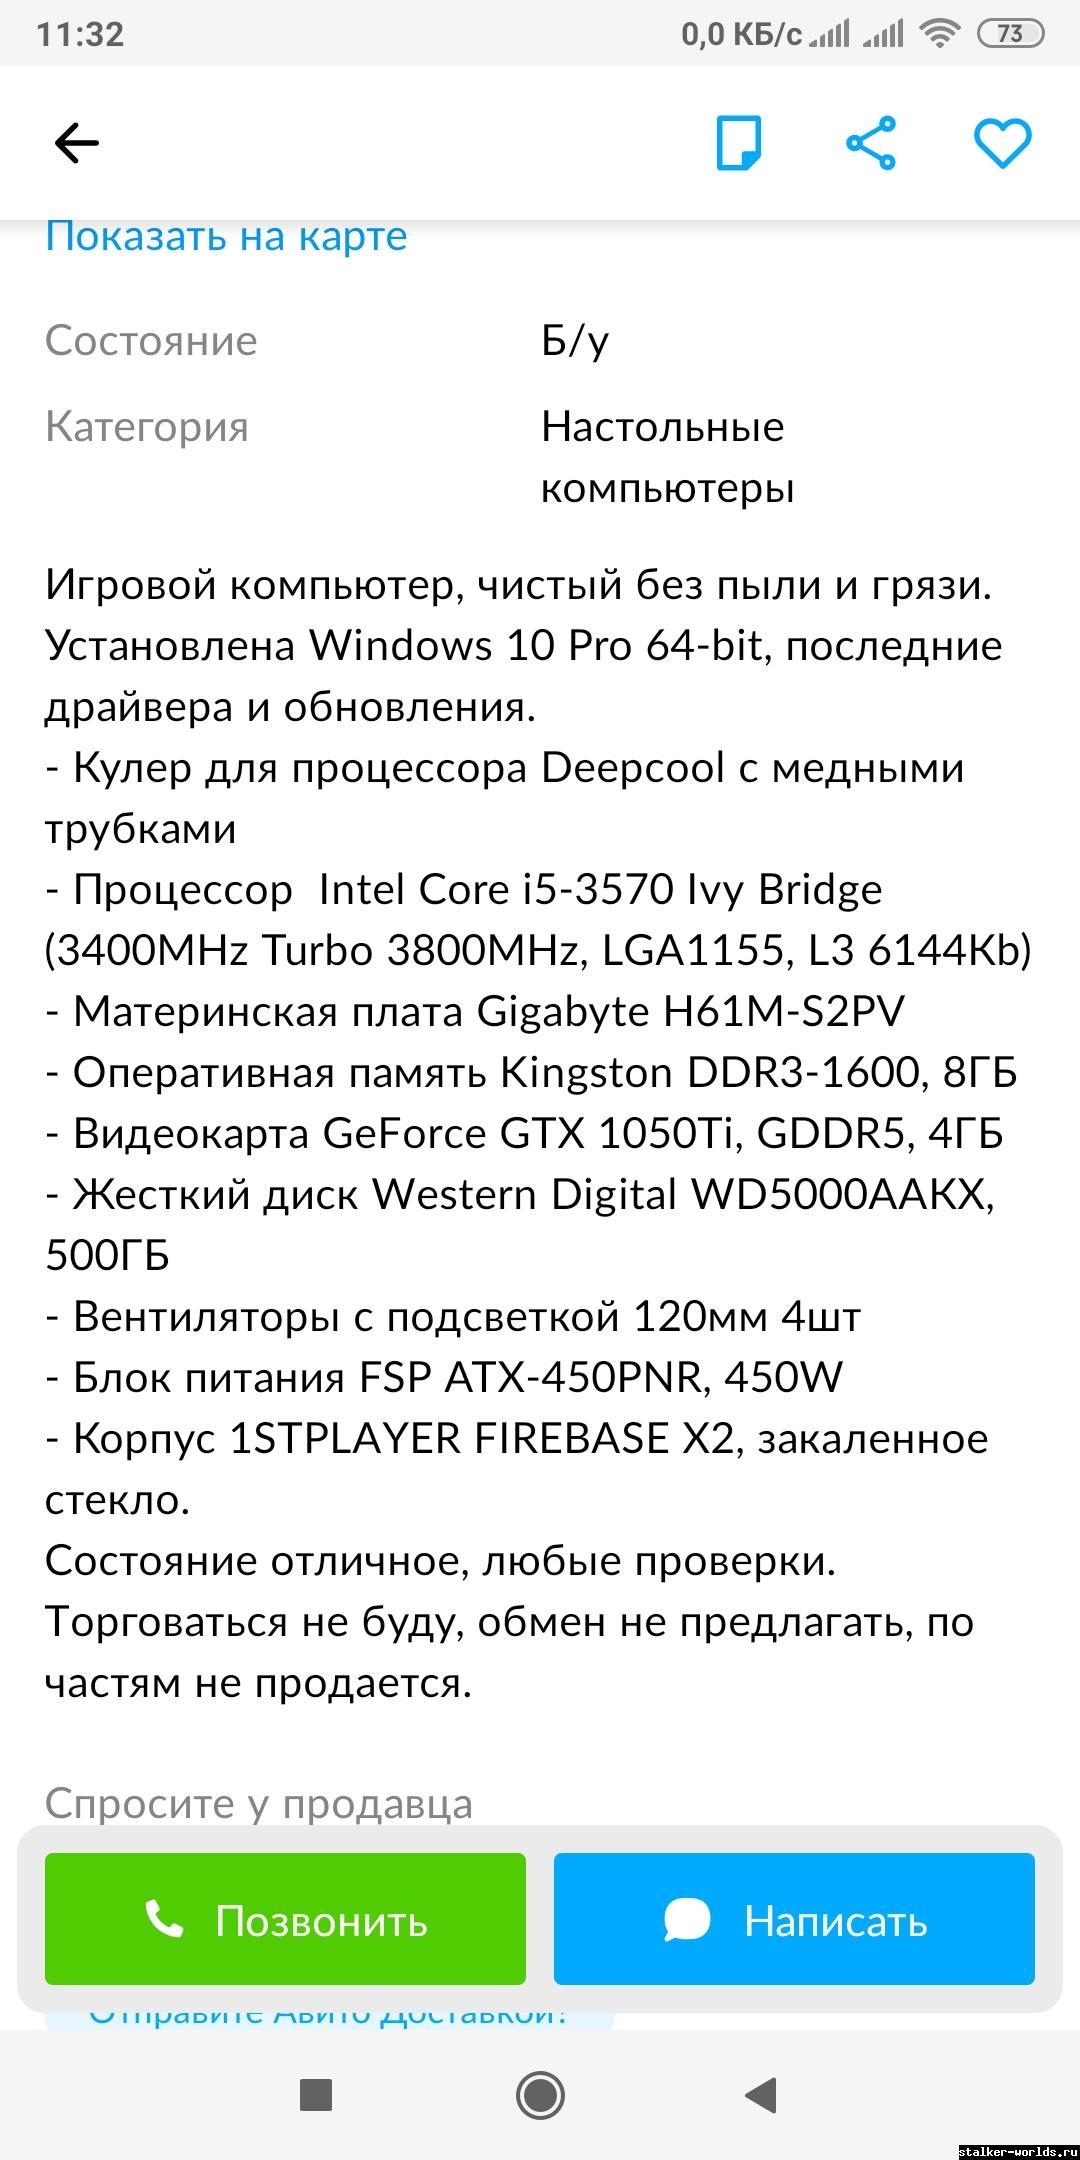 sw_1632299636__screenshot_2021-09-22-11-